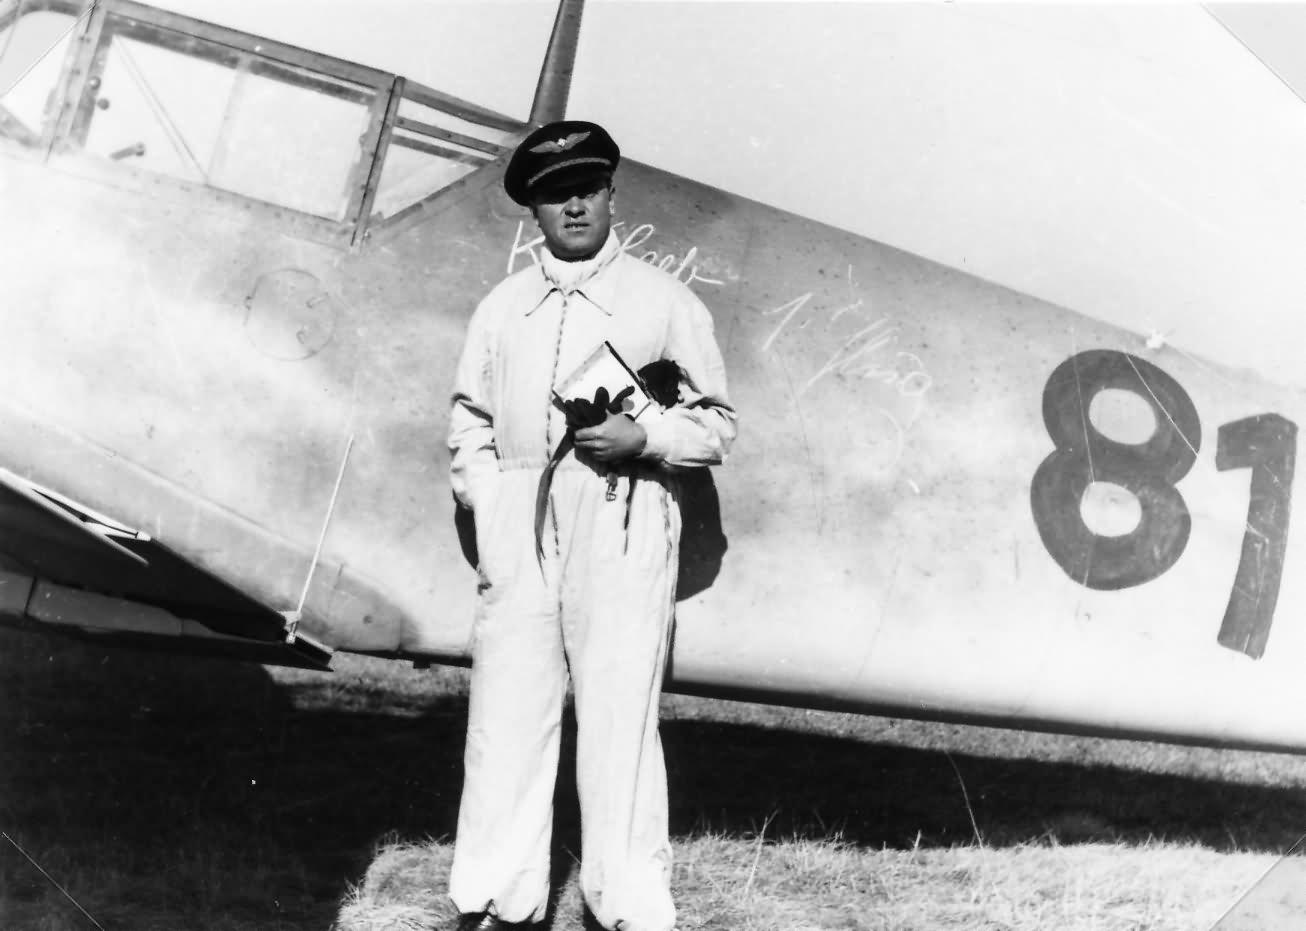 Messerschmitt Bf109 Wiener Neustadter Flugzeugwerke 81